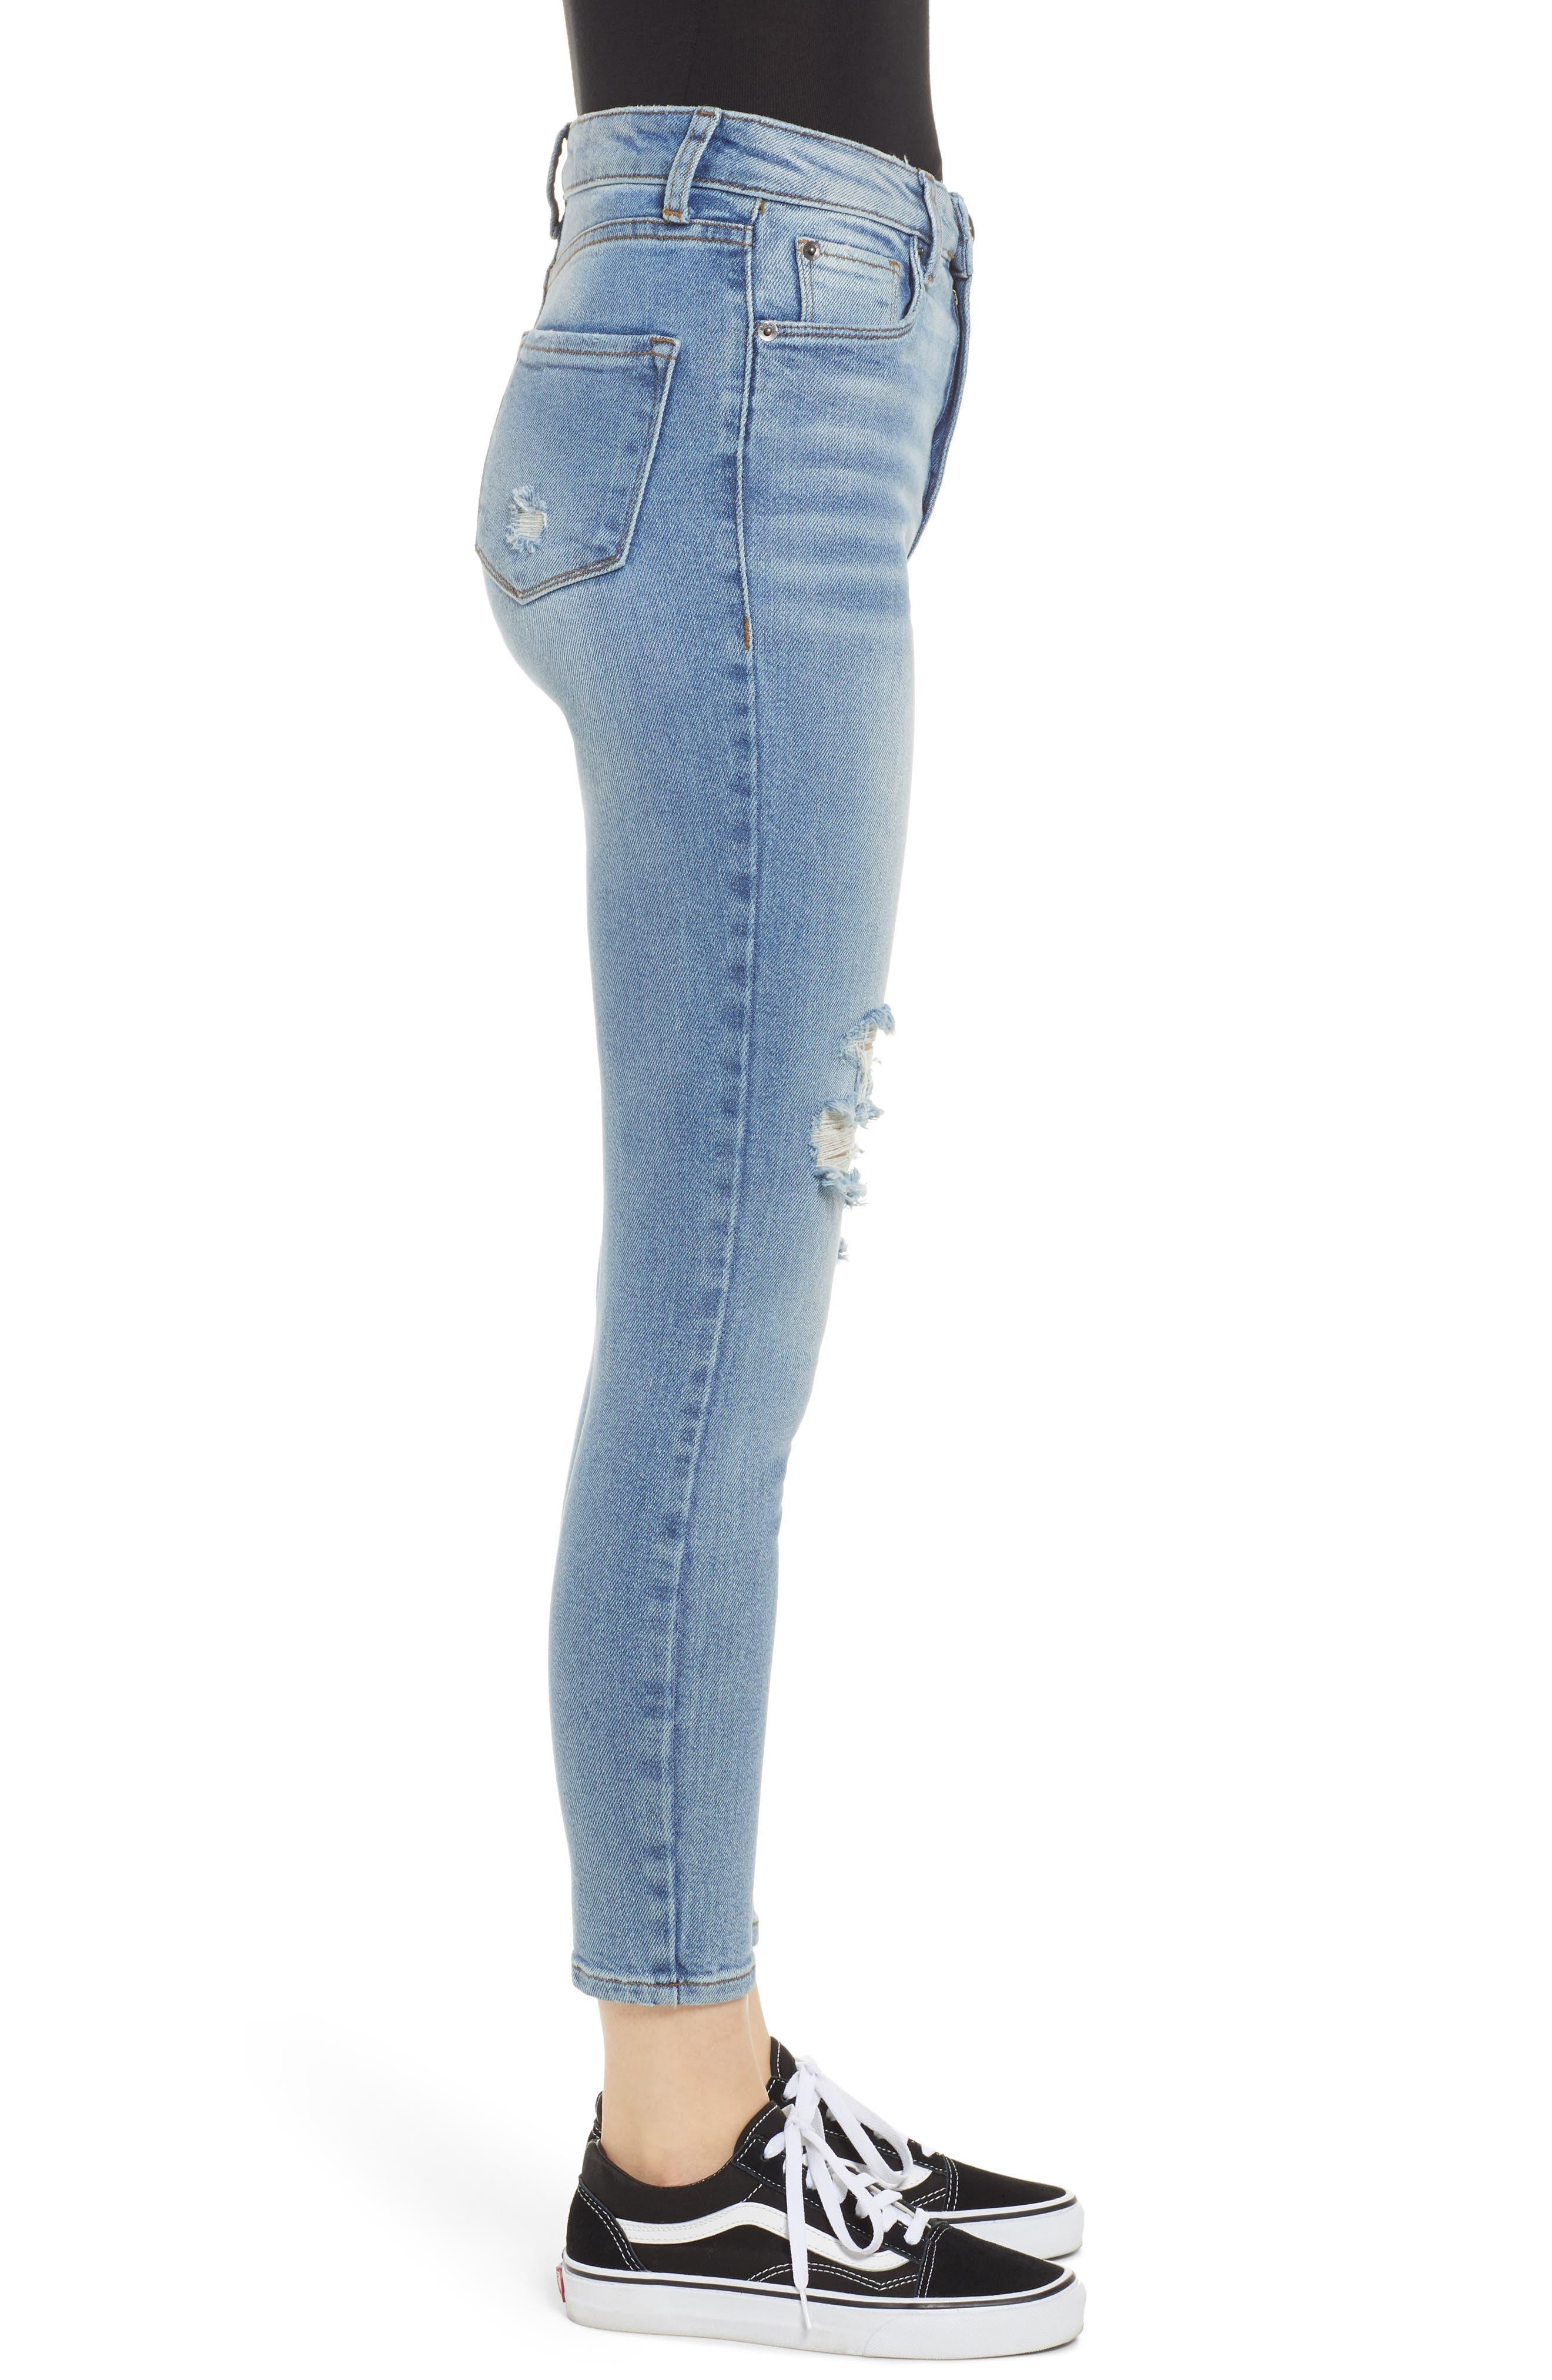 Brie High Waist Ripped Skinny Jeans,                             Alternate thumbnail 3, color,                             BRADFORD LIGHT WASH